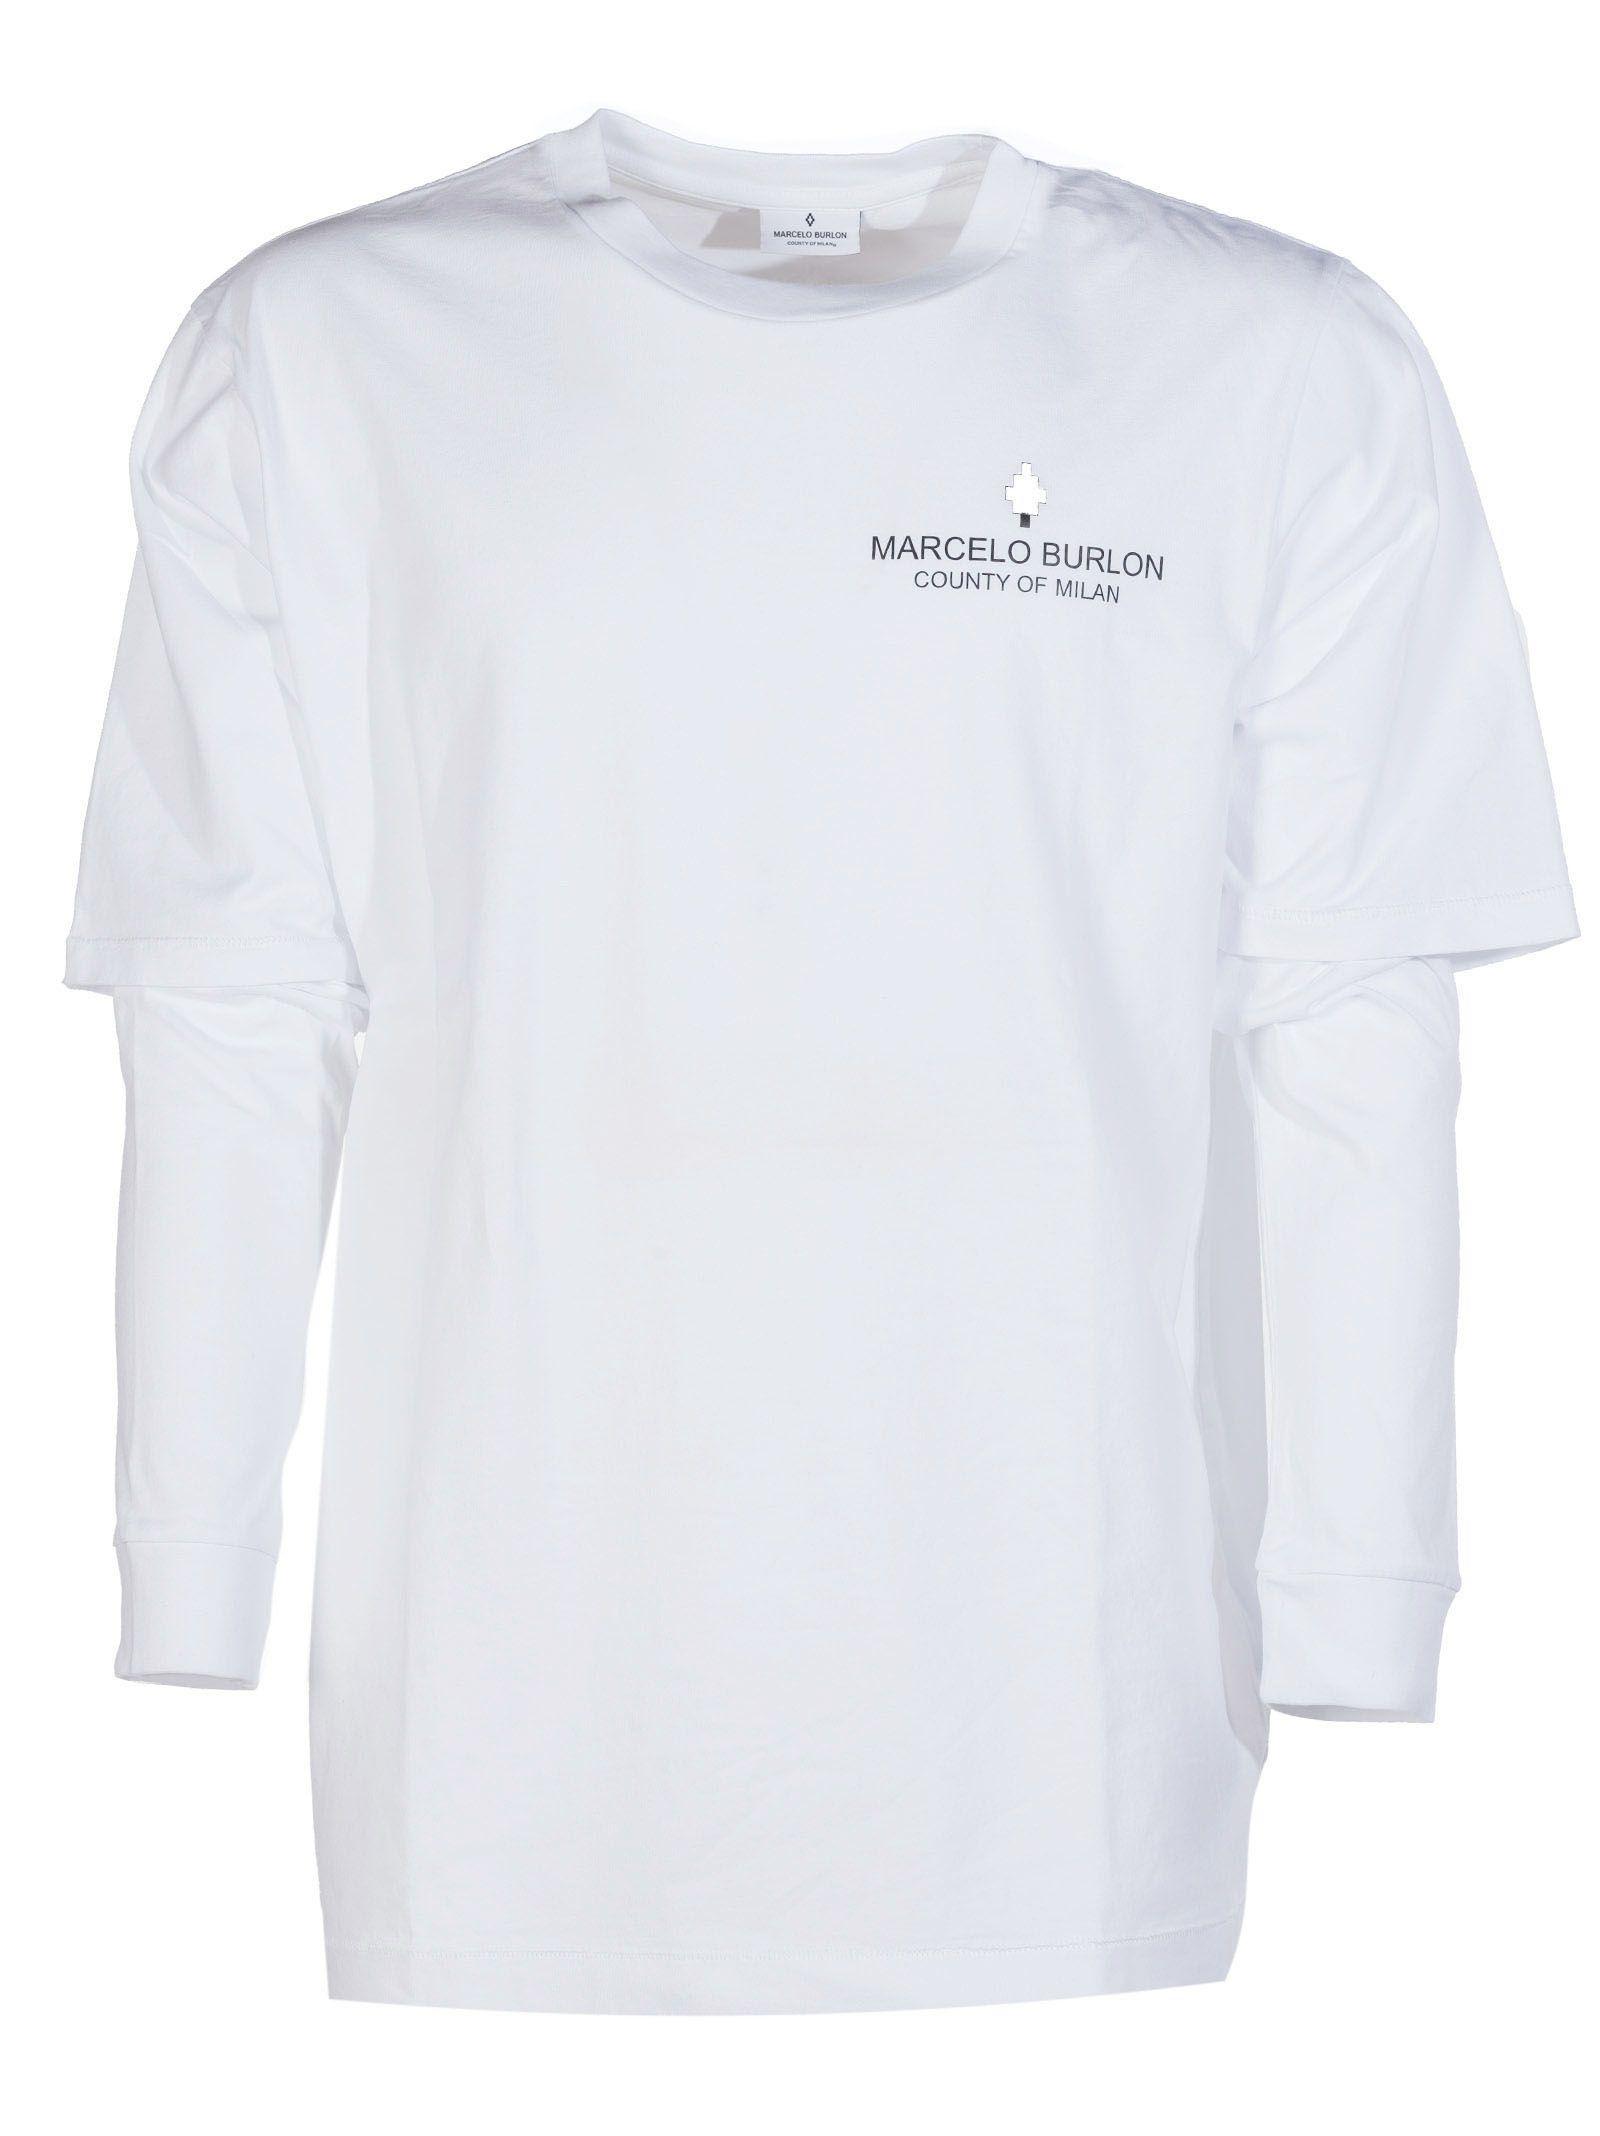 Marcelo Burlon Marcelo Burlon Grey Wing T-shirt